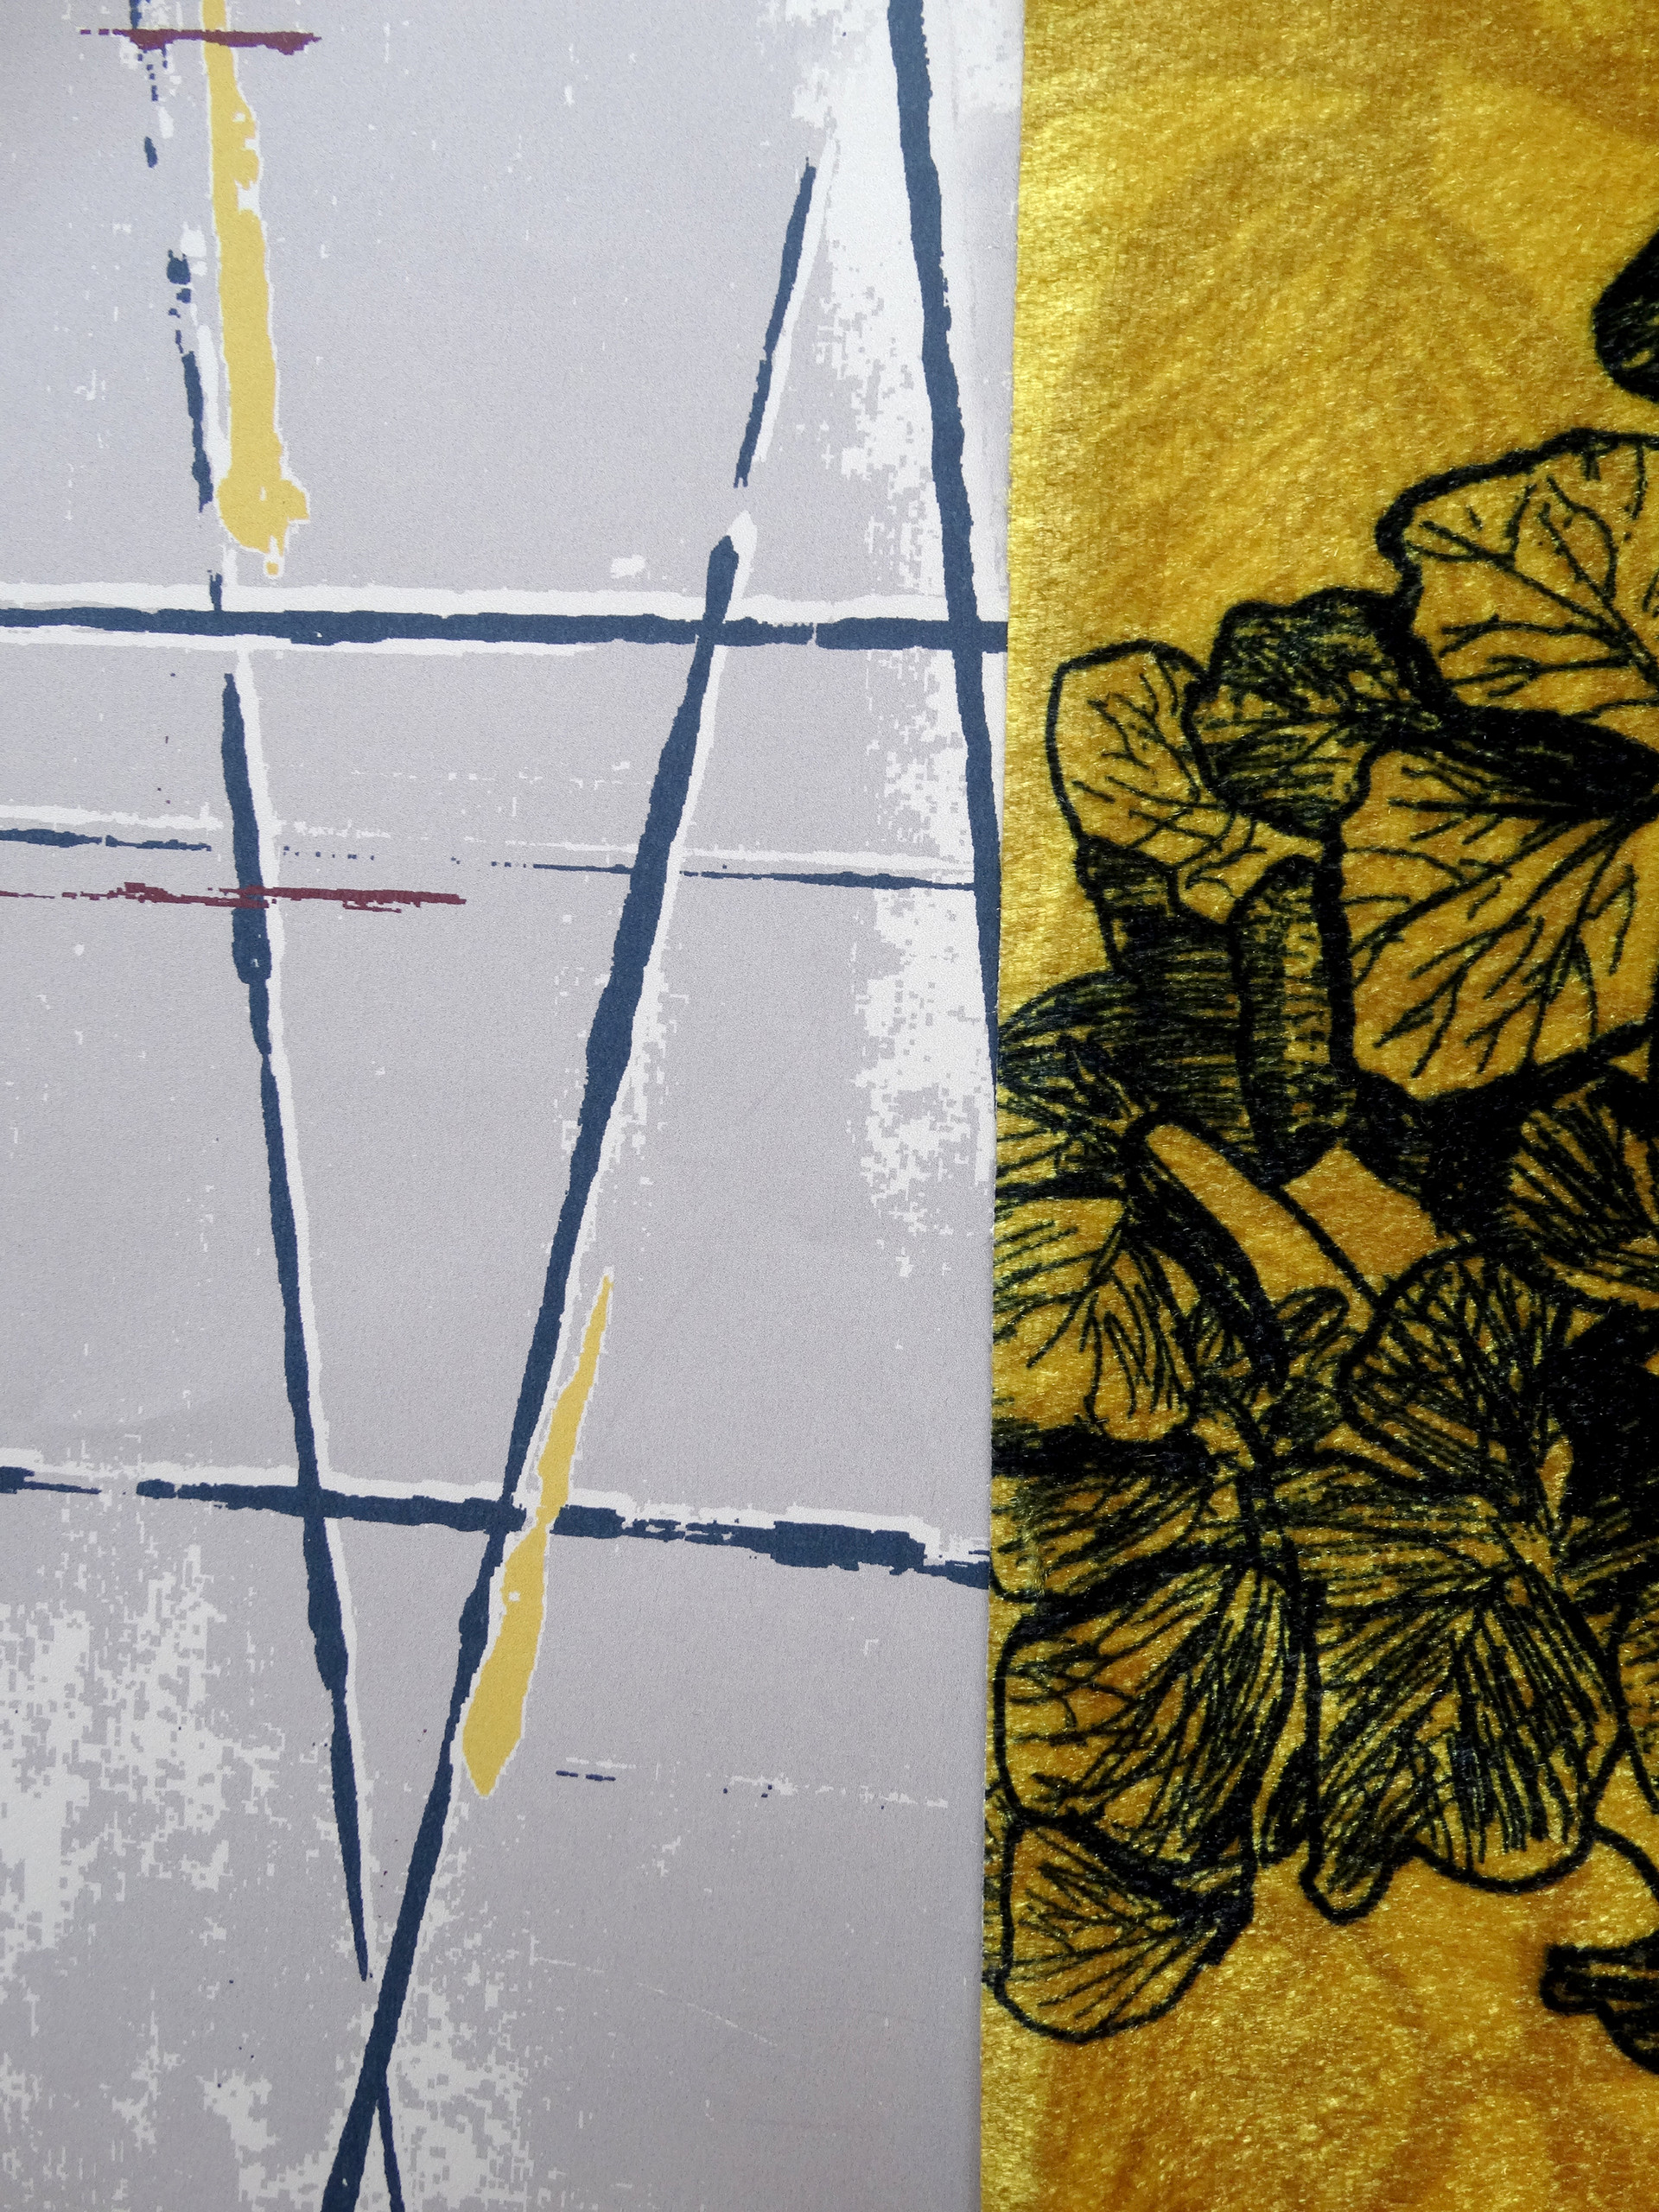 hydrangea fabric design alongside the geometric wallpaper design